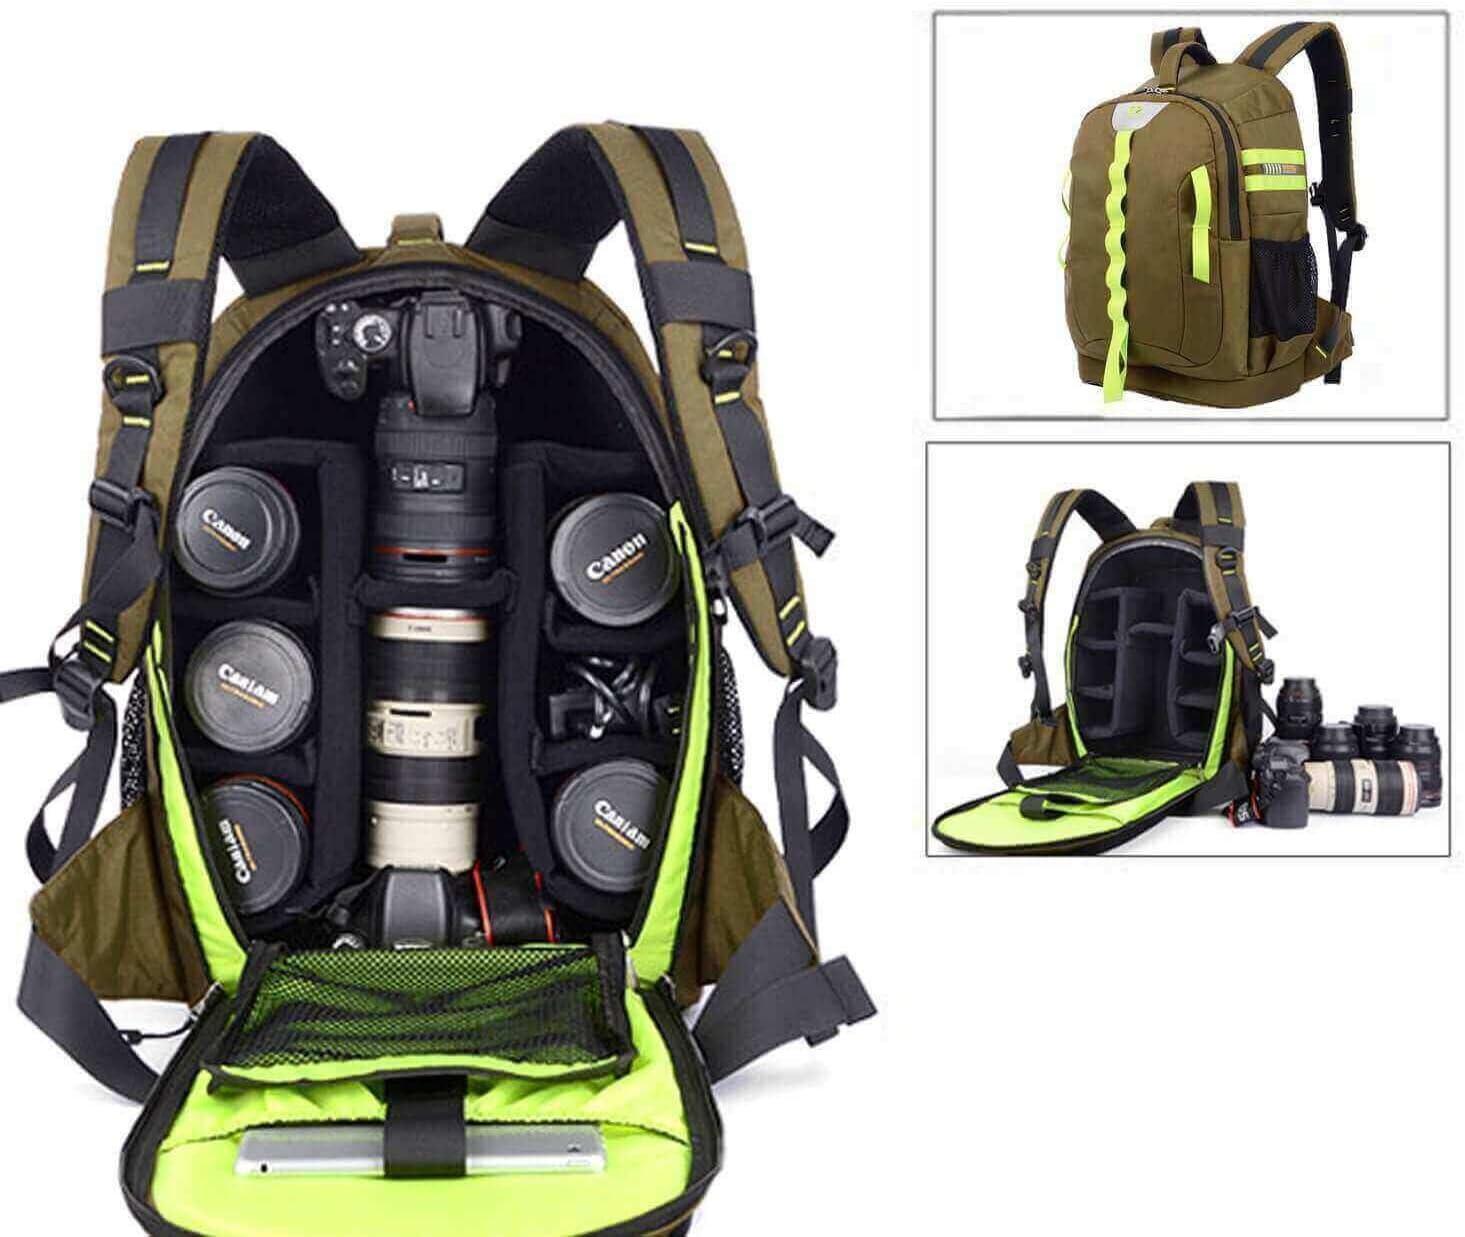 Abonnyc DRLBP-CZ Waterproof Anti-shock Backpack for DSLR and SLR Cameras (Green)